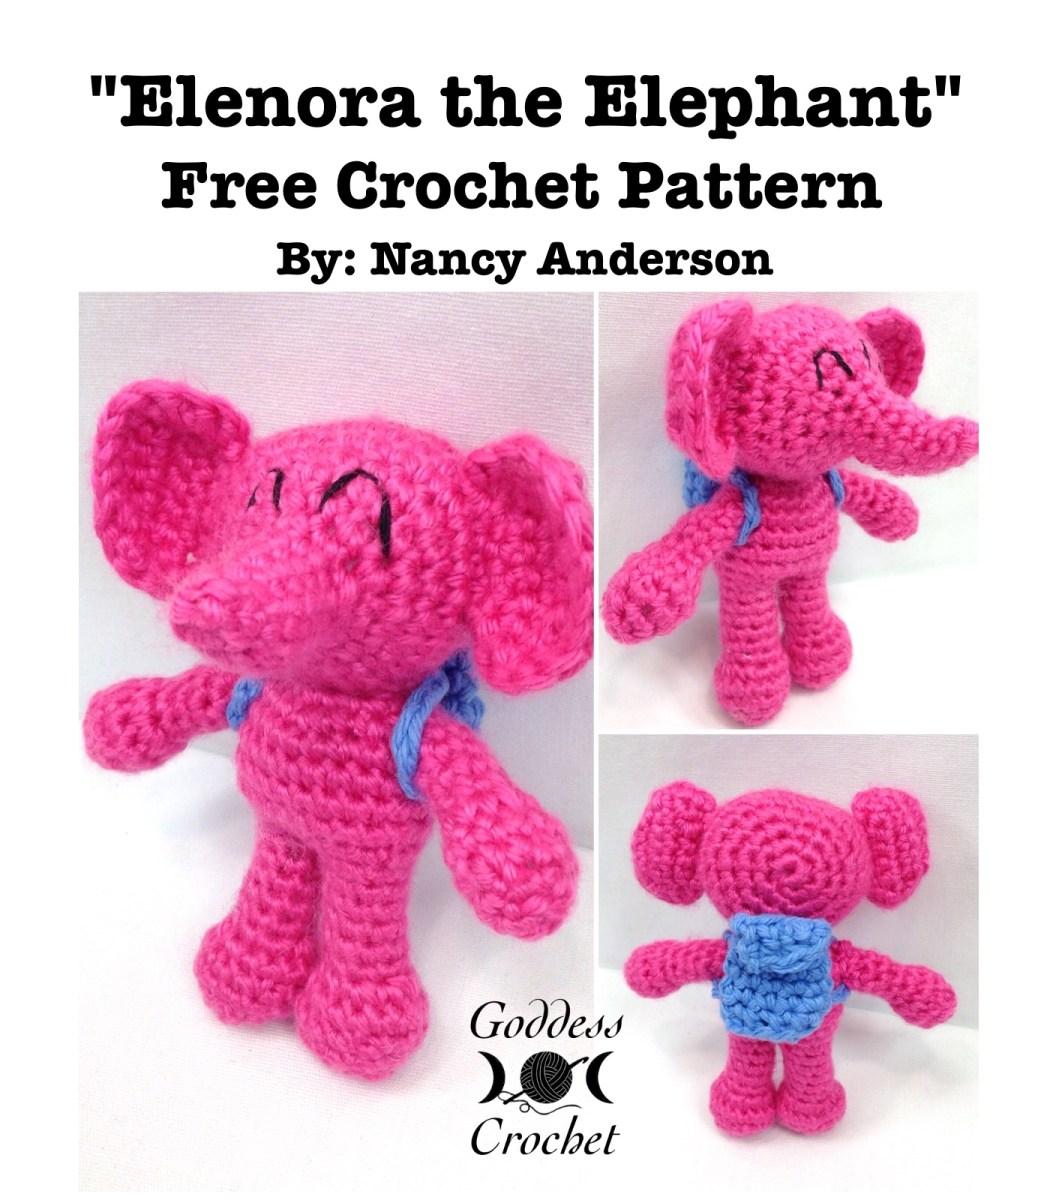 Amigurumi Elephant – Free Crochet Pattern Review – Goddess Crochet